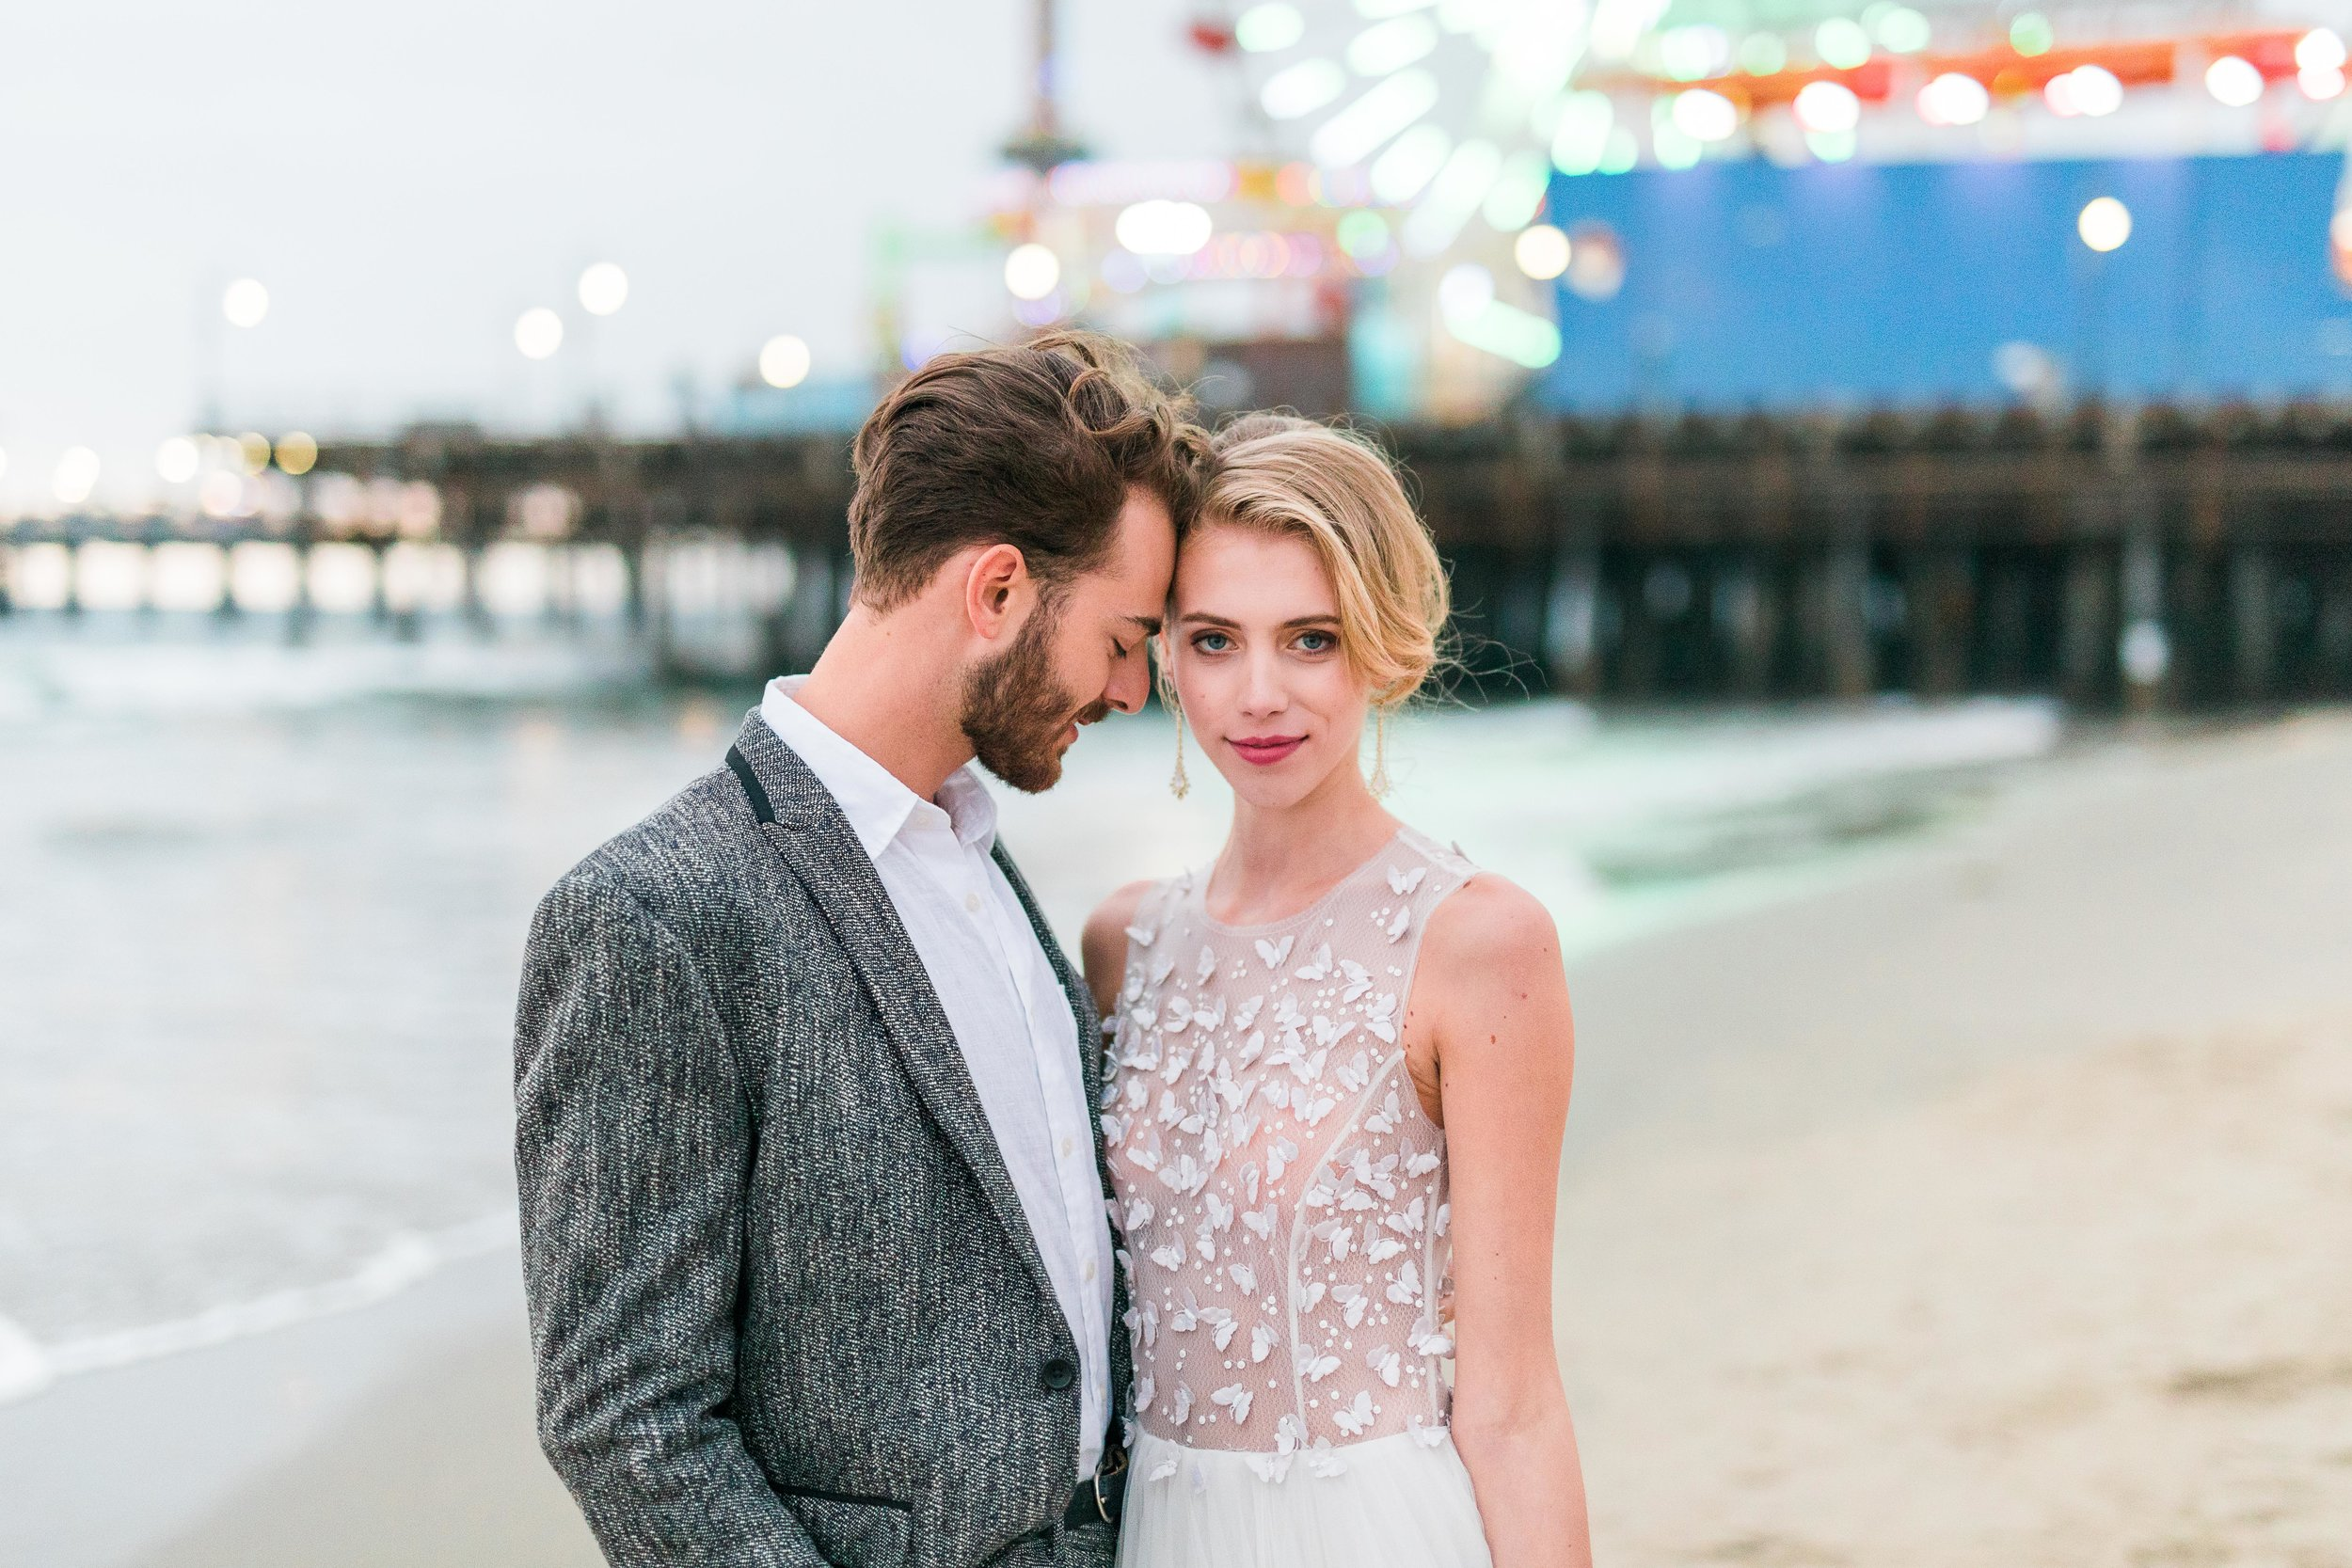 LA-Wedding-Shoot-by-JBJ-Pictures-171.jpg